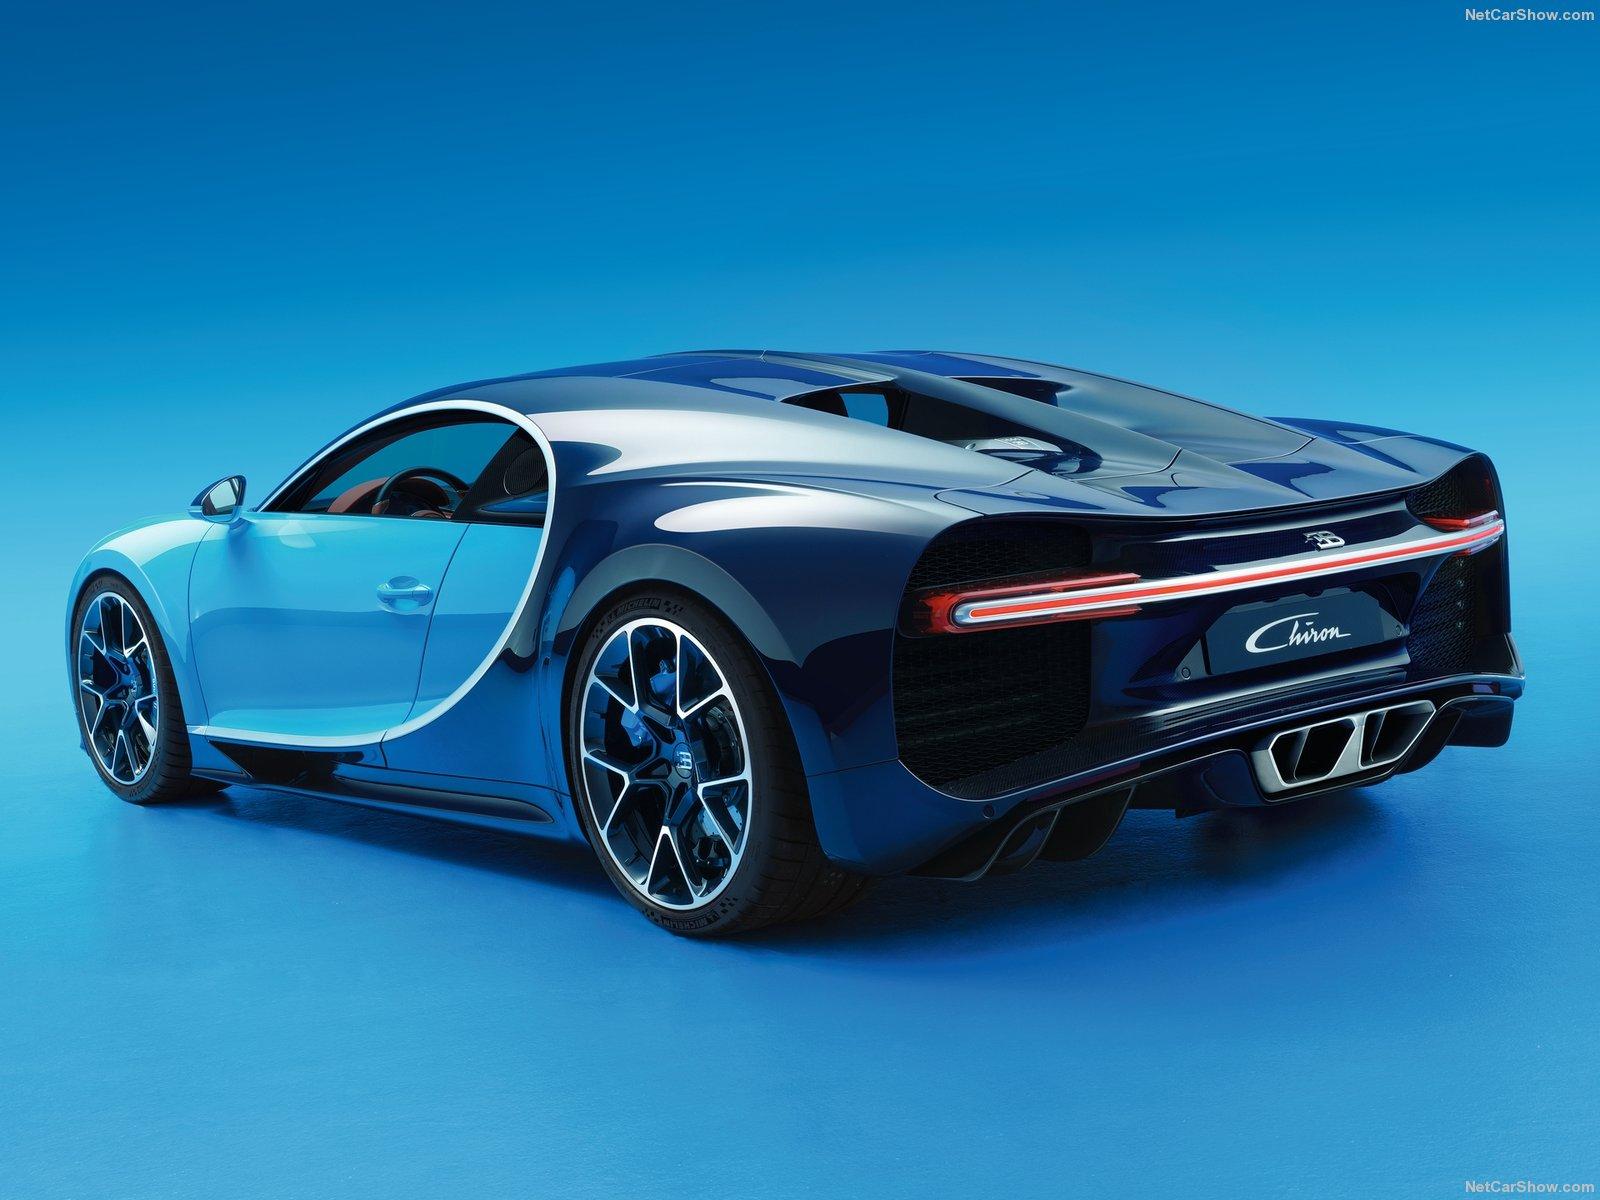 Bugatti-Chiron_2017_1600x1200_wallpaper_1f